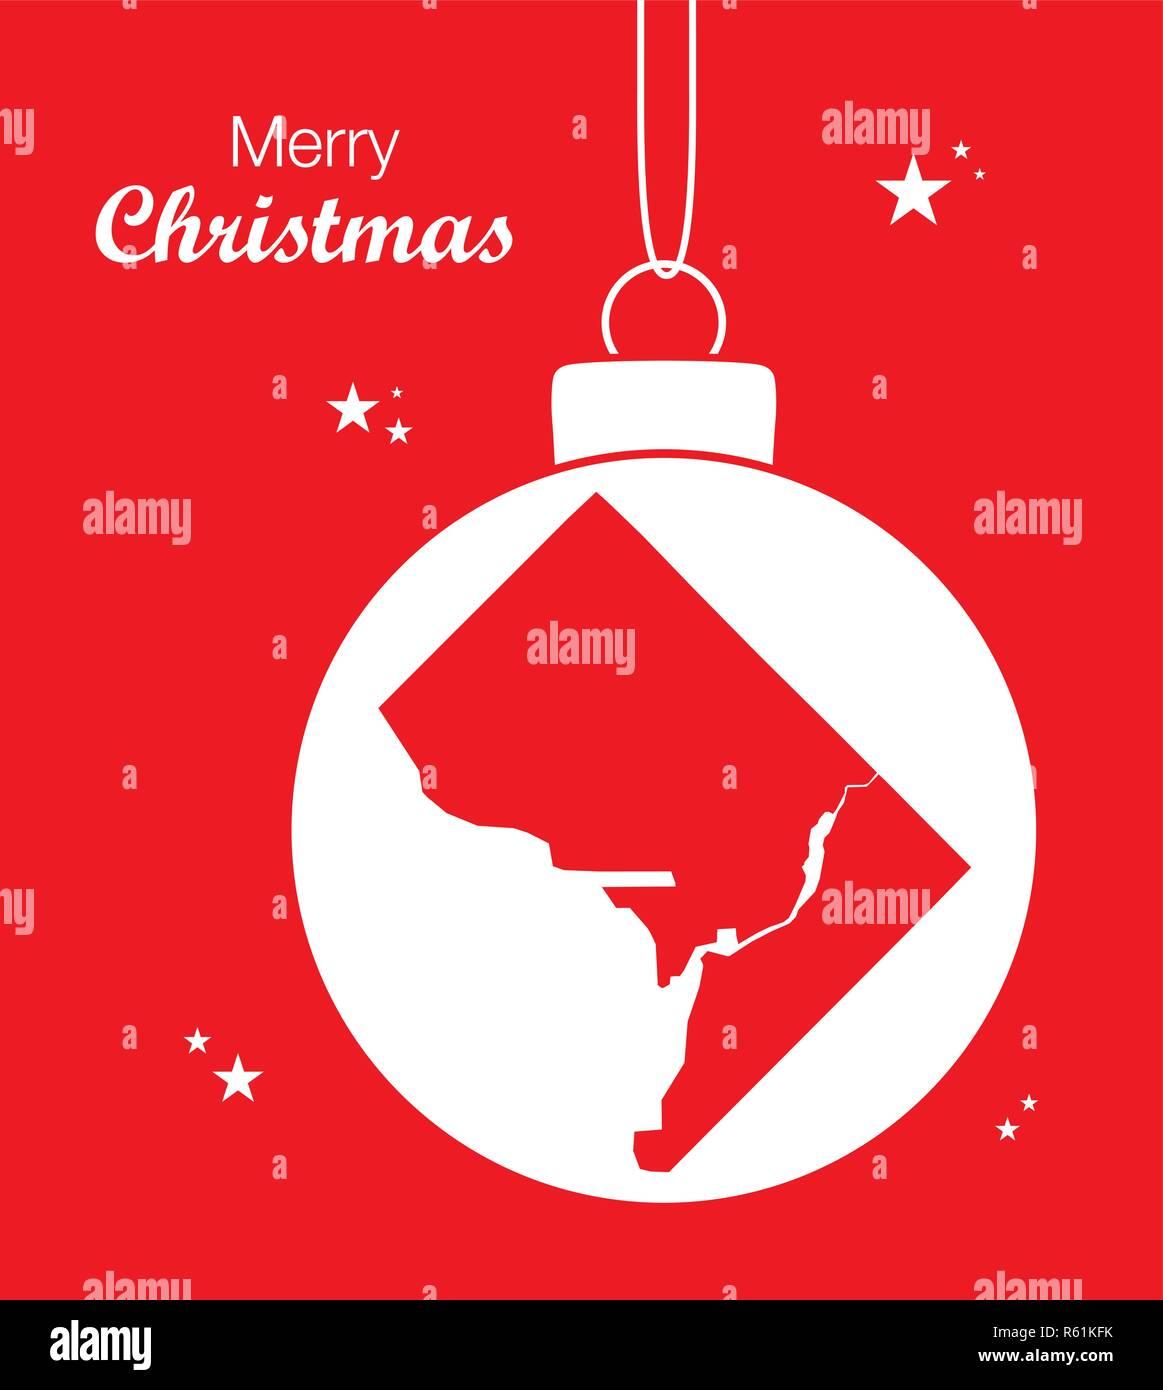 Merry Christmas illustration theme with map of Washington DC - Stock Vector